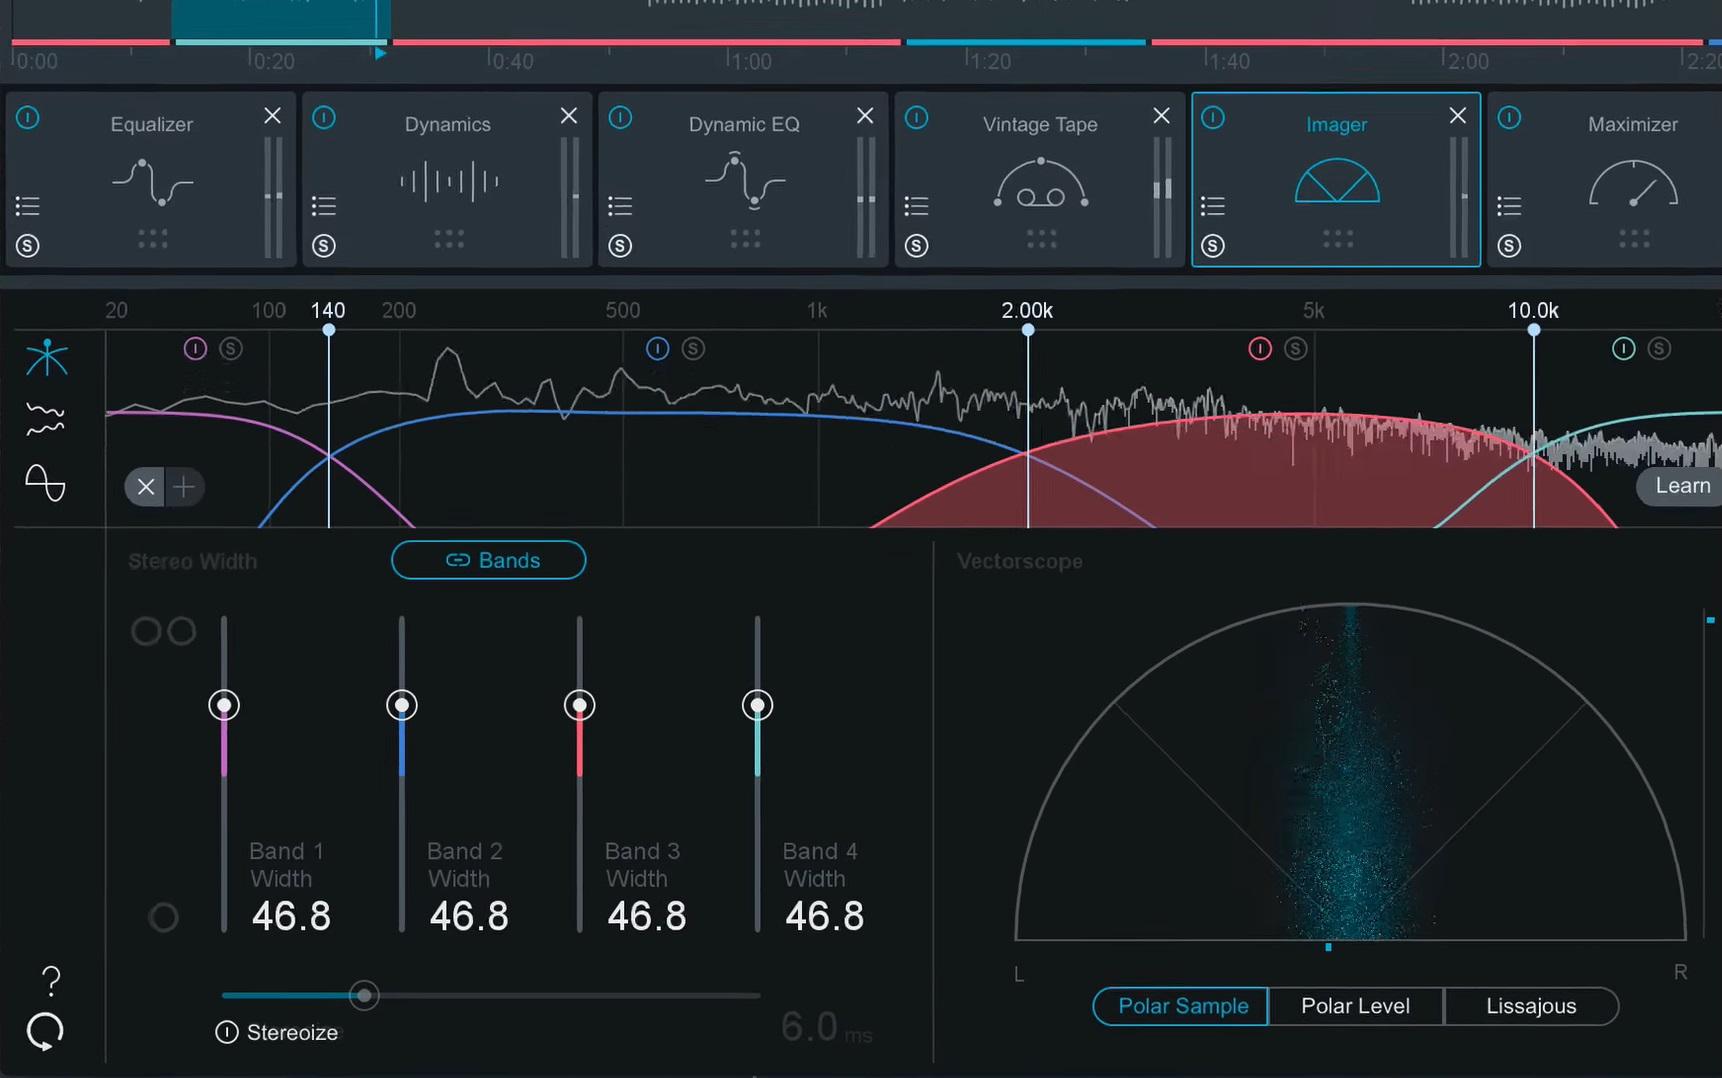 iZotope Unveils Ozone 8 Advanced Mastering Software